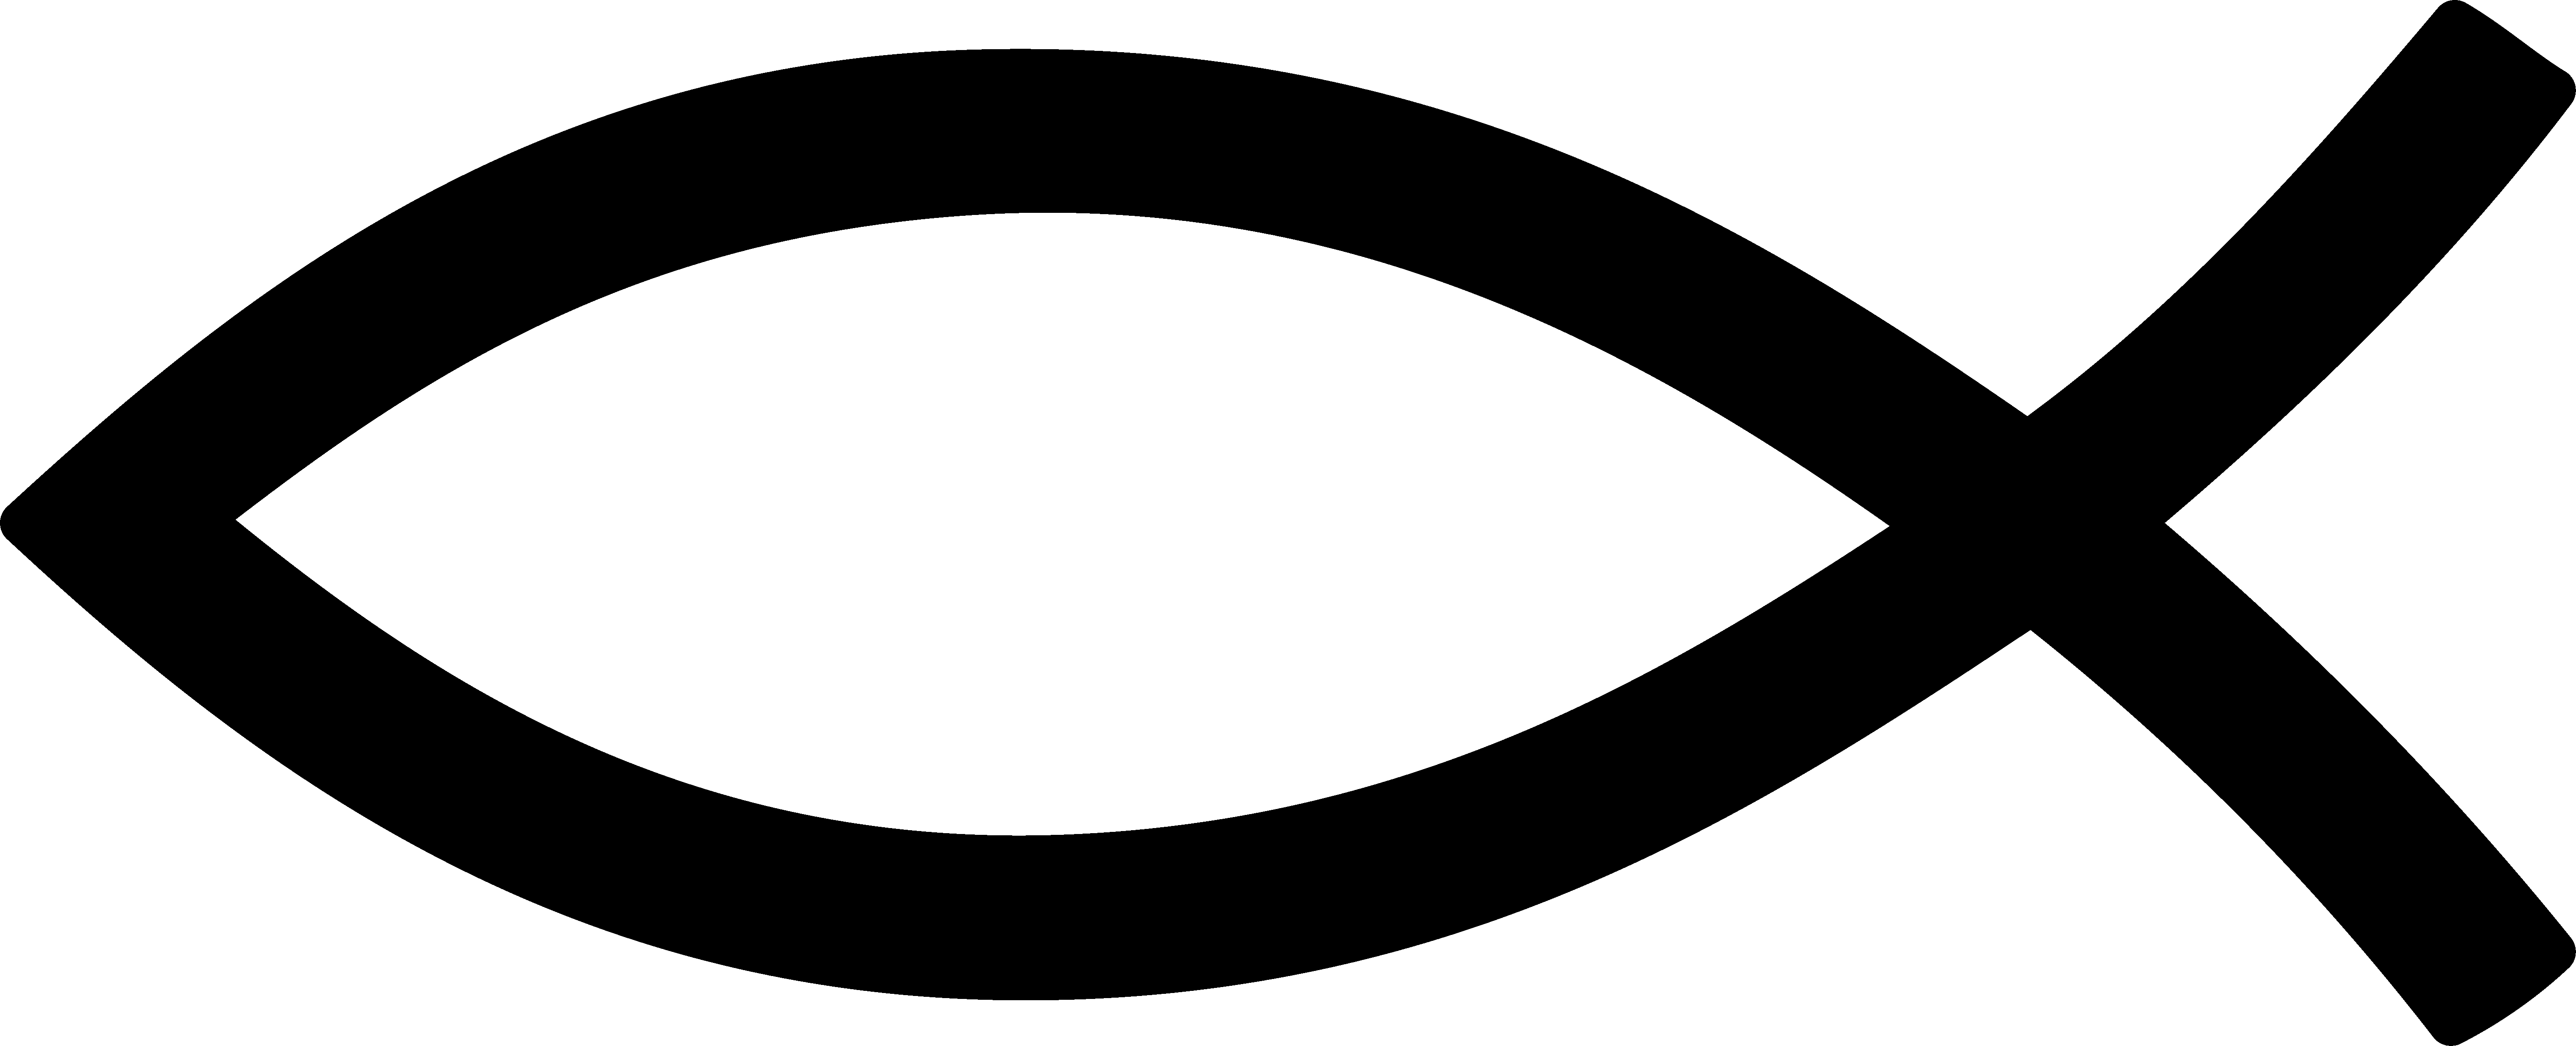 6075x2467 Ichthys Christian Fish Symbol